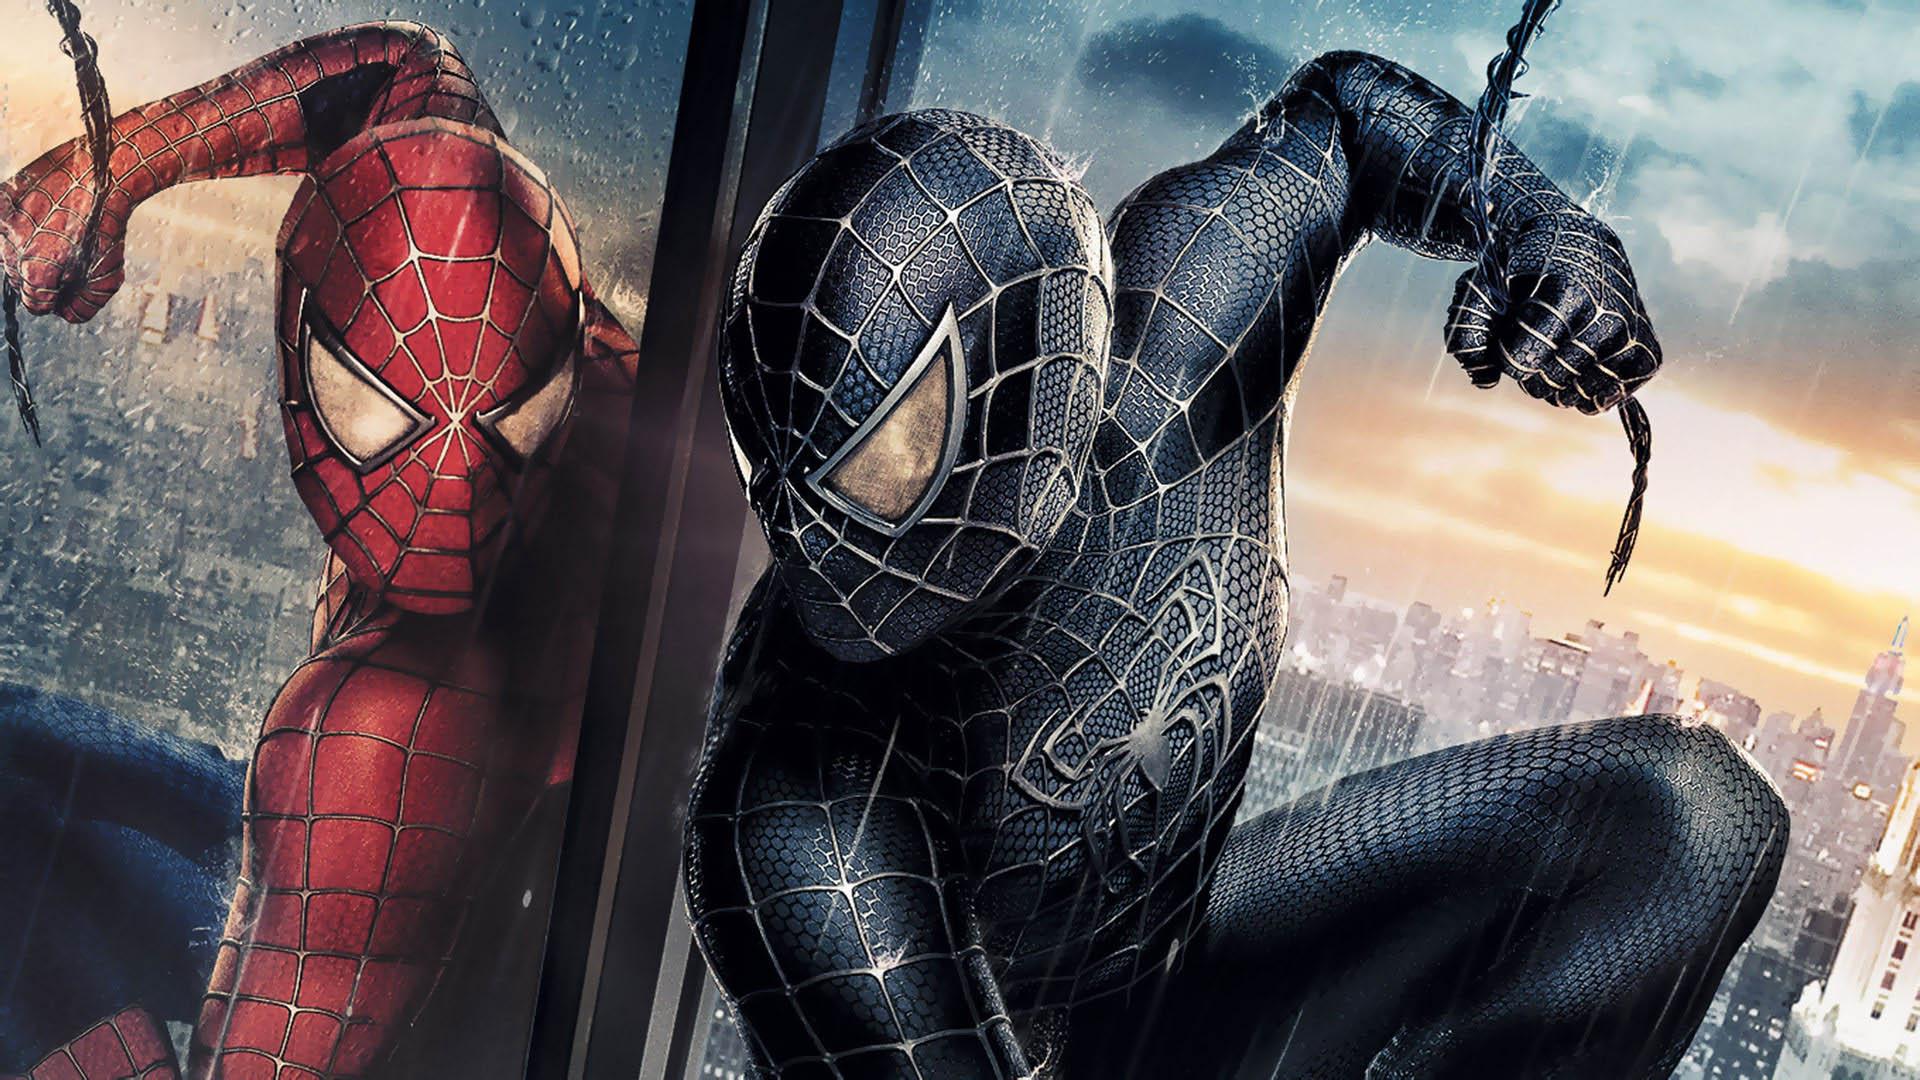 Spiderman Movie Wallpapers Hd Widescreen 8751 Wallpaper 1920x1080